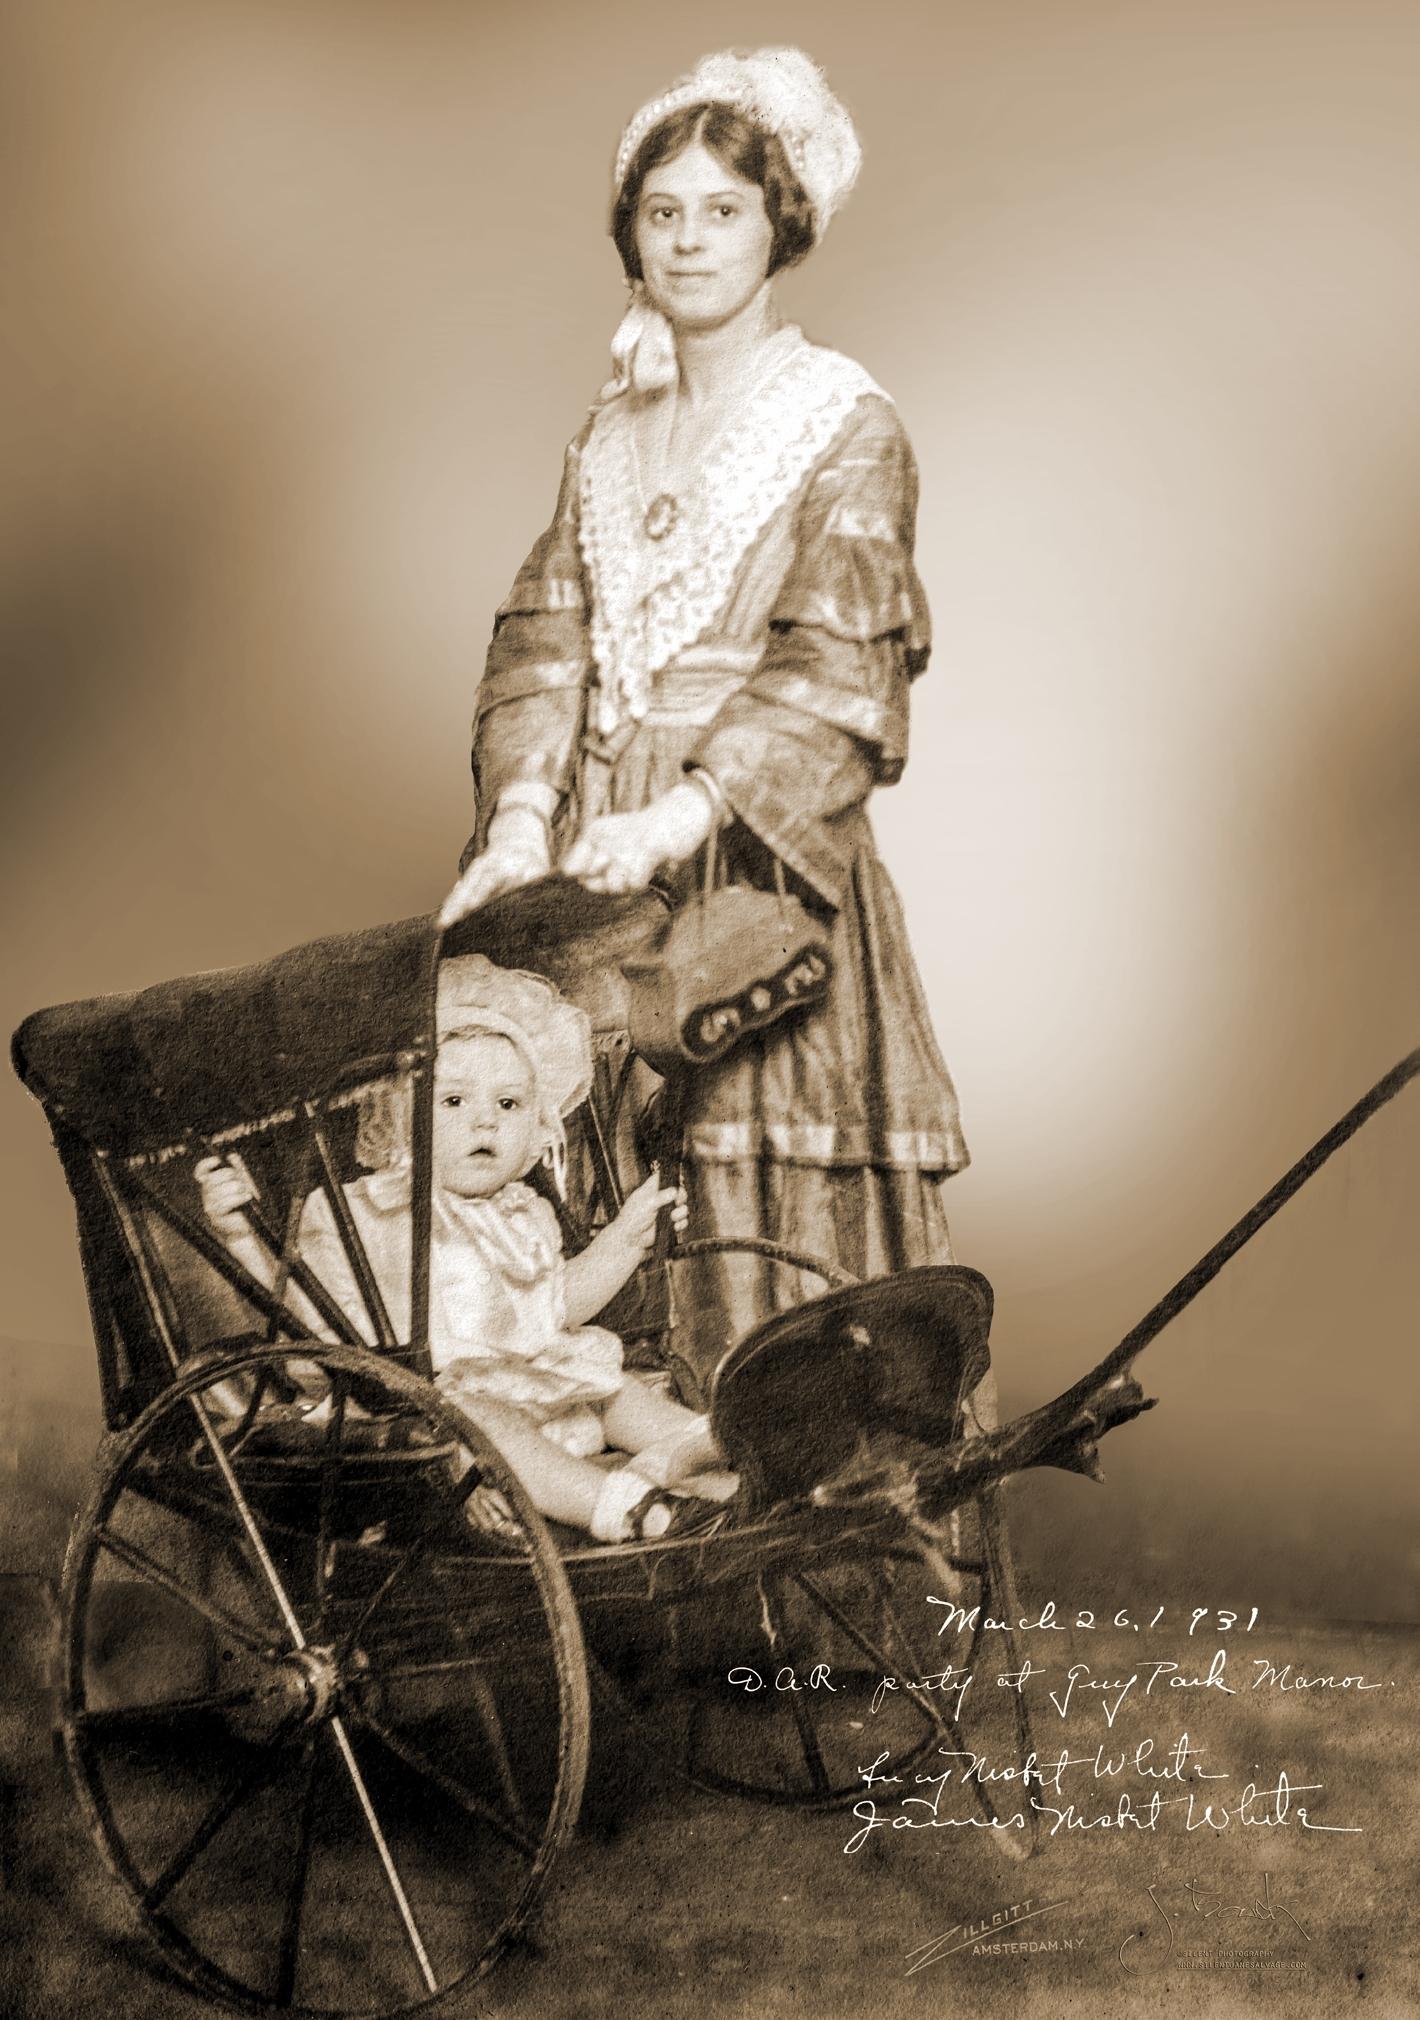 Helen White - Mother Moved Behind Stroller Sepia 5.25x7.25 300ppi 10-5-2017.jpg